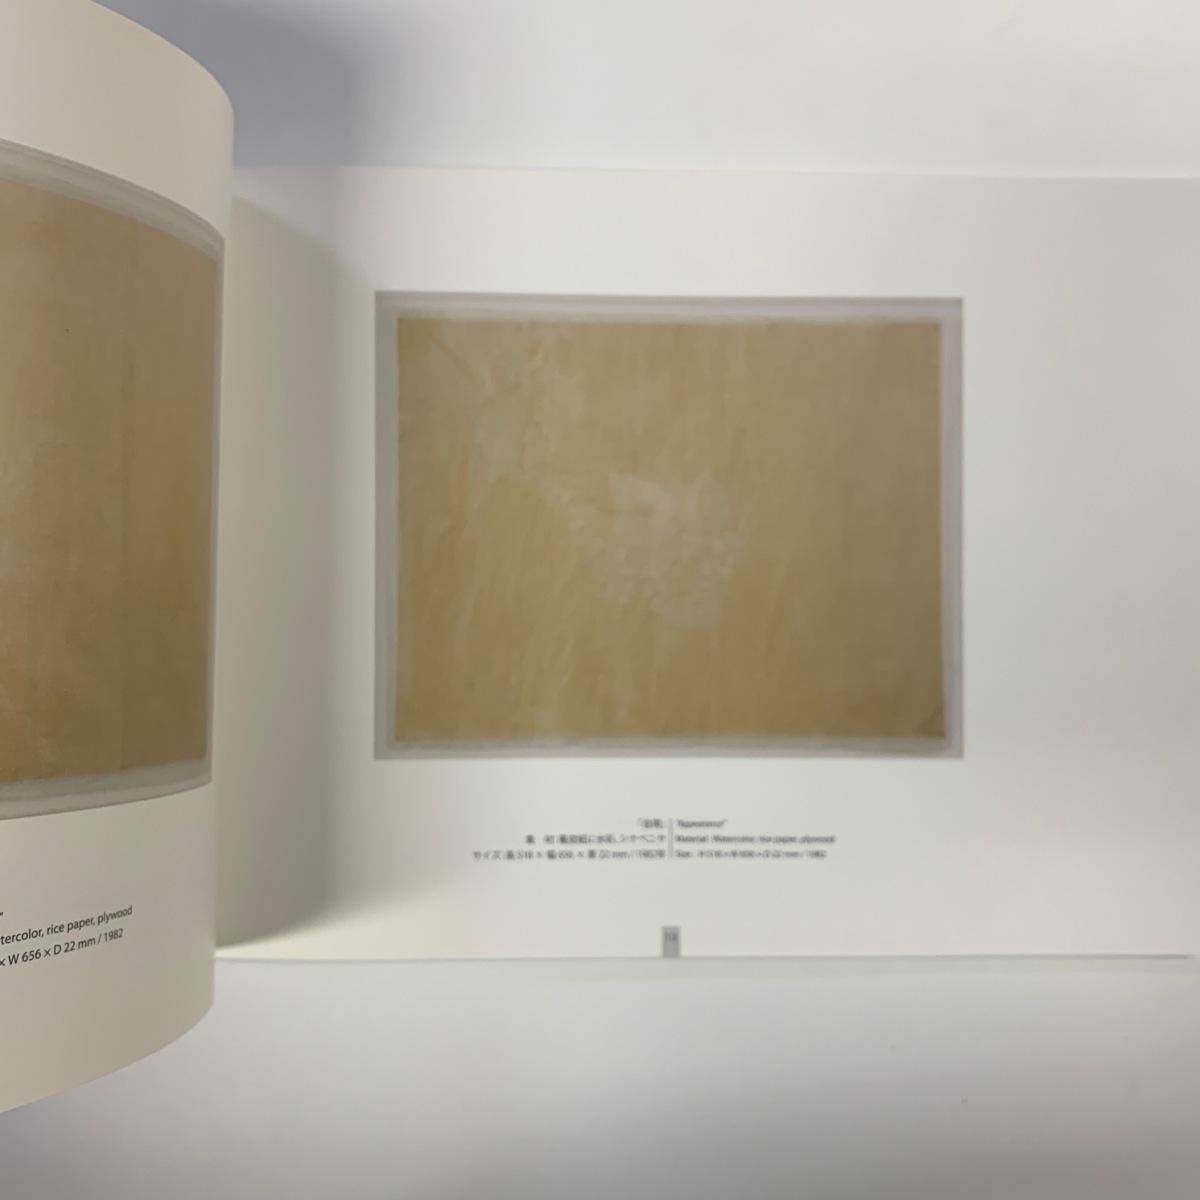 zeit / LIGHTE 渡辺好明遺作展 光ではかられた時 2012年 東京芸術大学美術館陳列館 <ゆうメール>_画像4